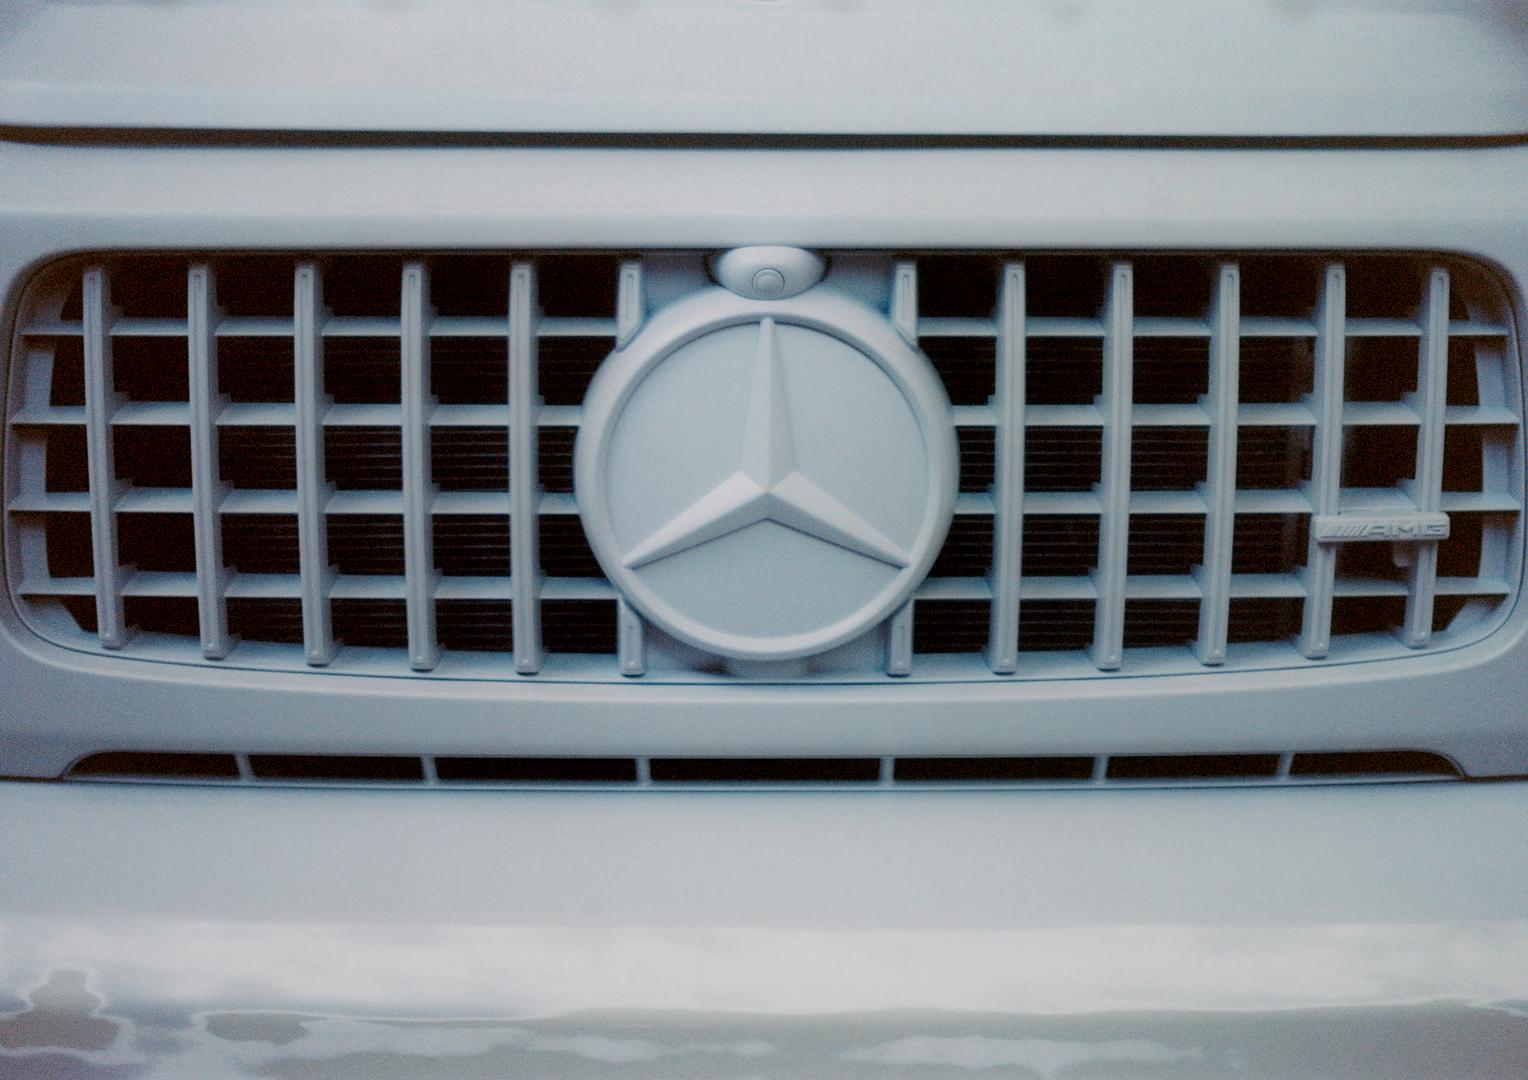 Mercedes-Benz G-Wagon Emblem